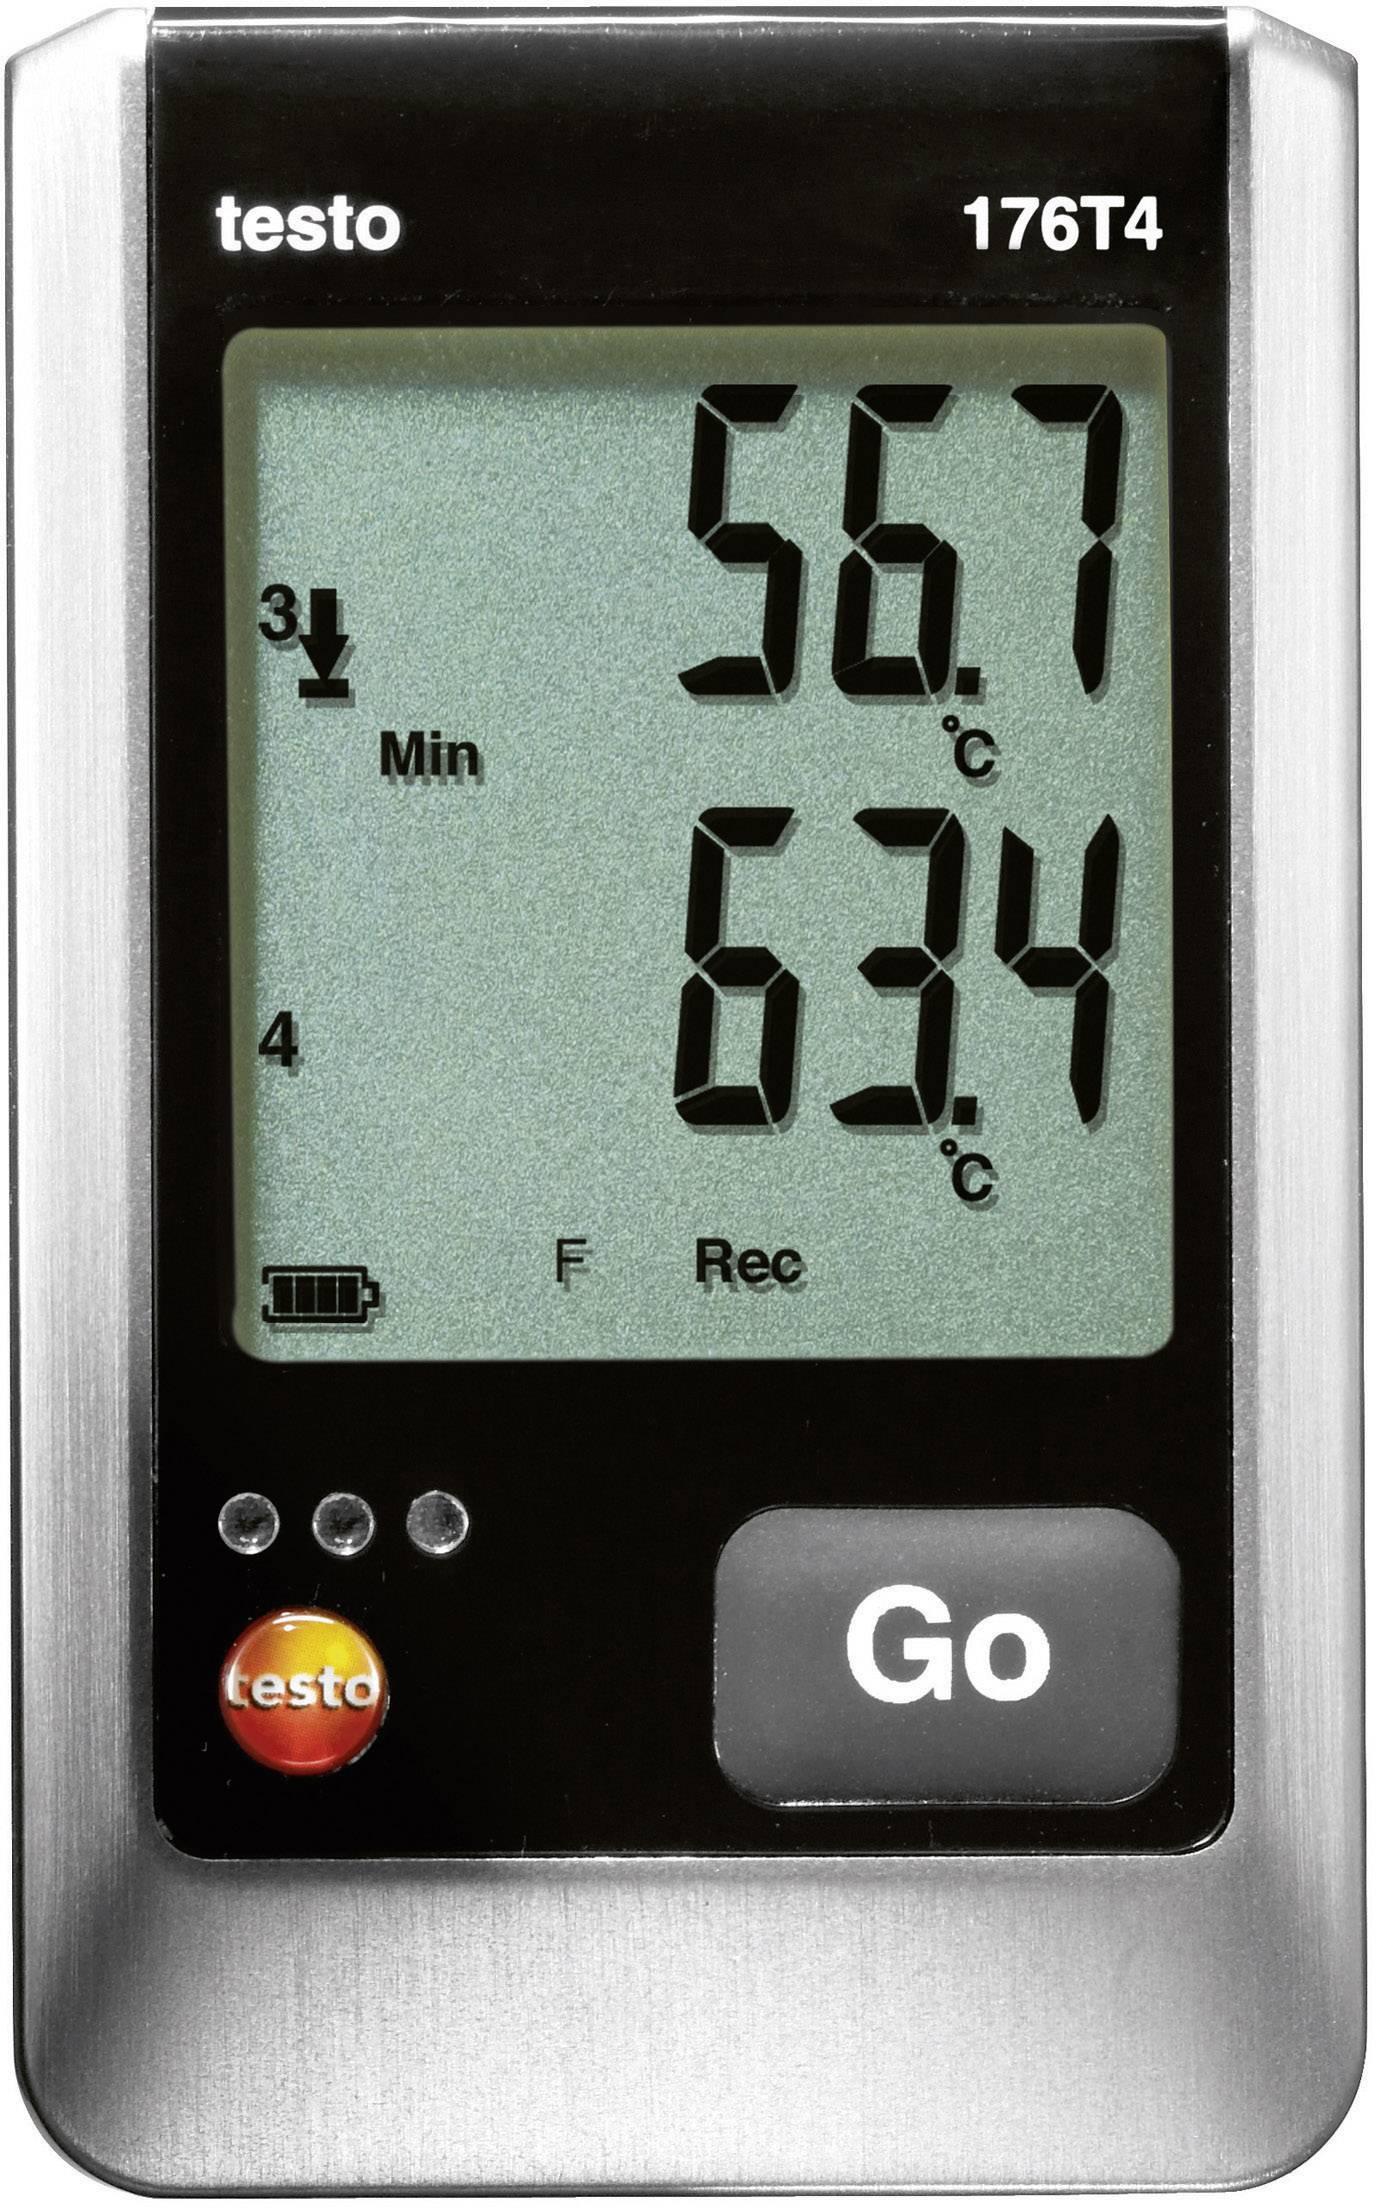 Teplotný datalogger testo 176-T4, -200 až +400 °C Typ T, -195 až +1000 °C Typ K